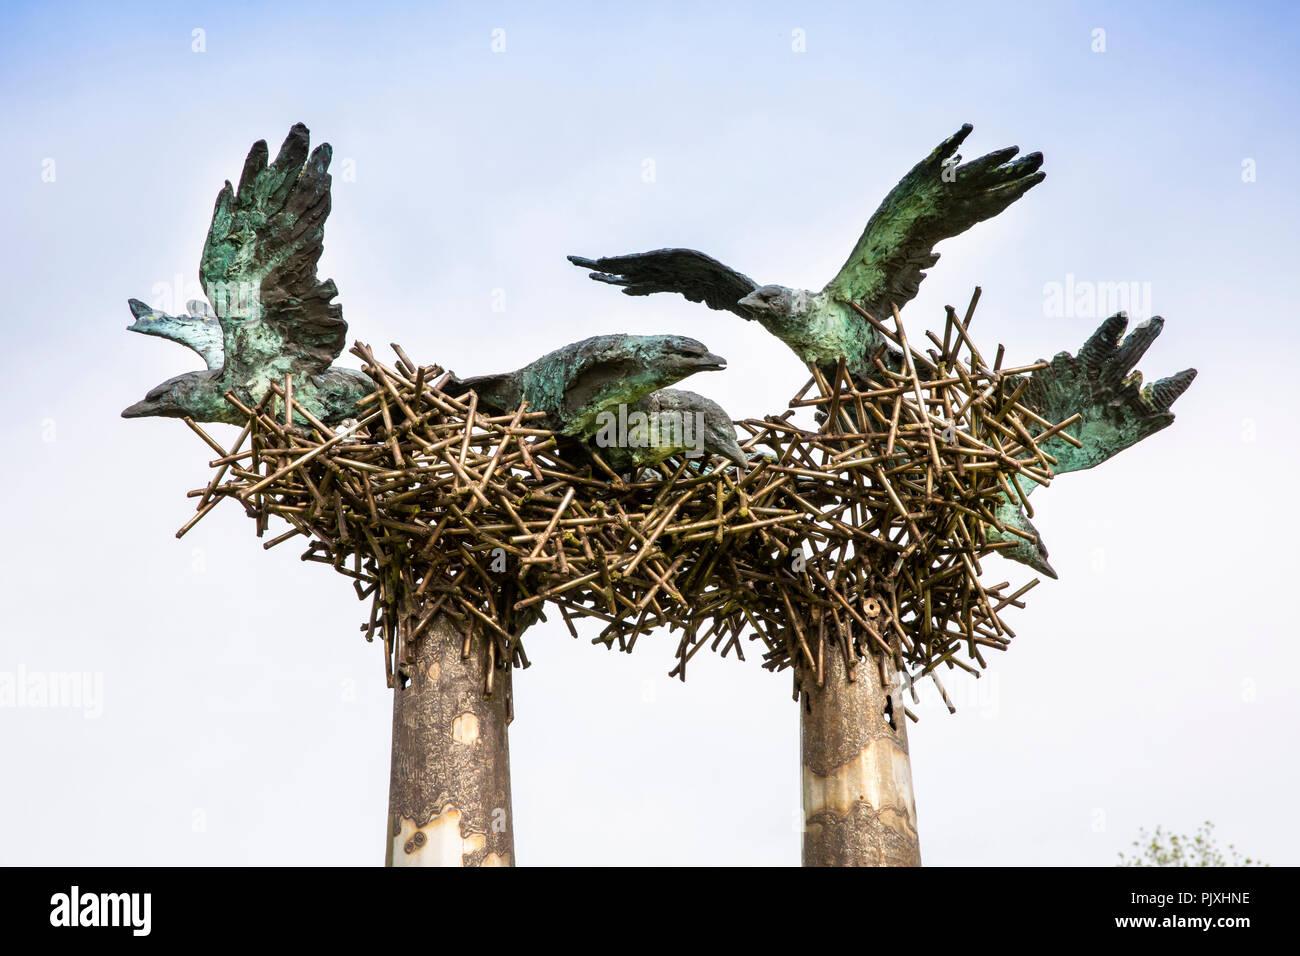 Ireland, Co Leitrim, Drumkeerin, Amenity Area, nesting birds scuplture Stock Photo